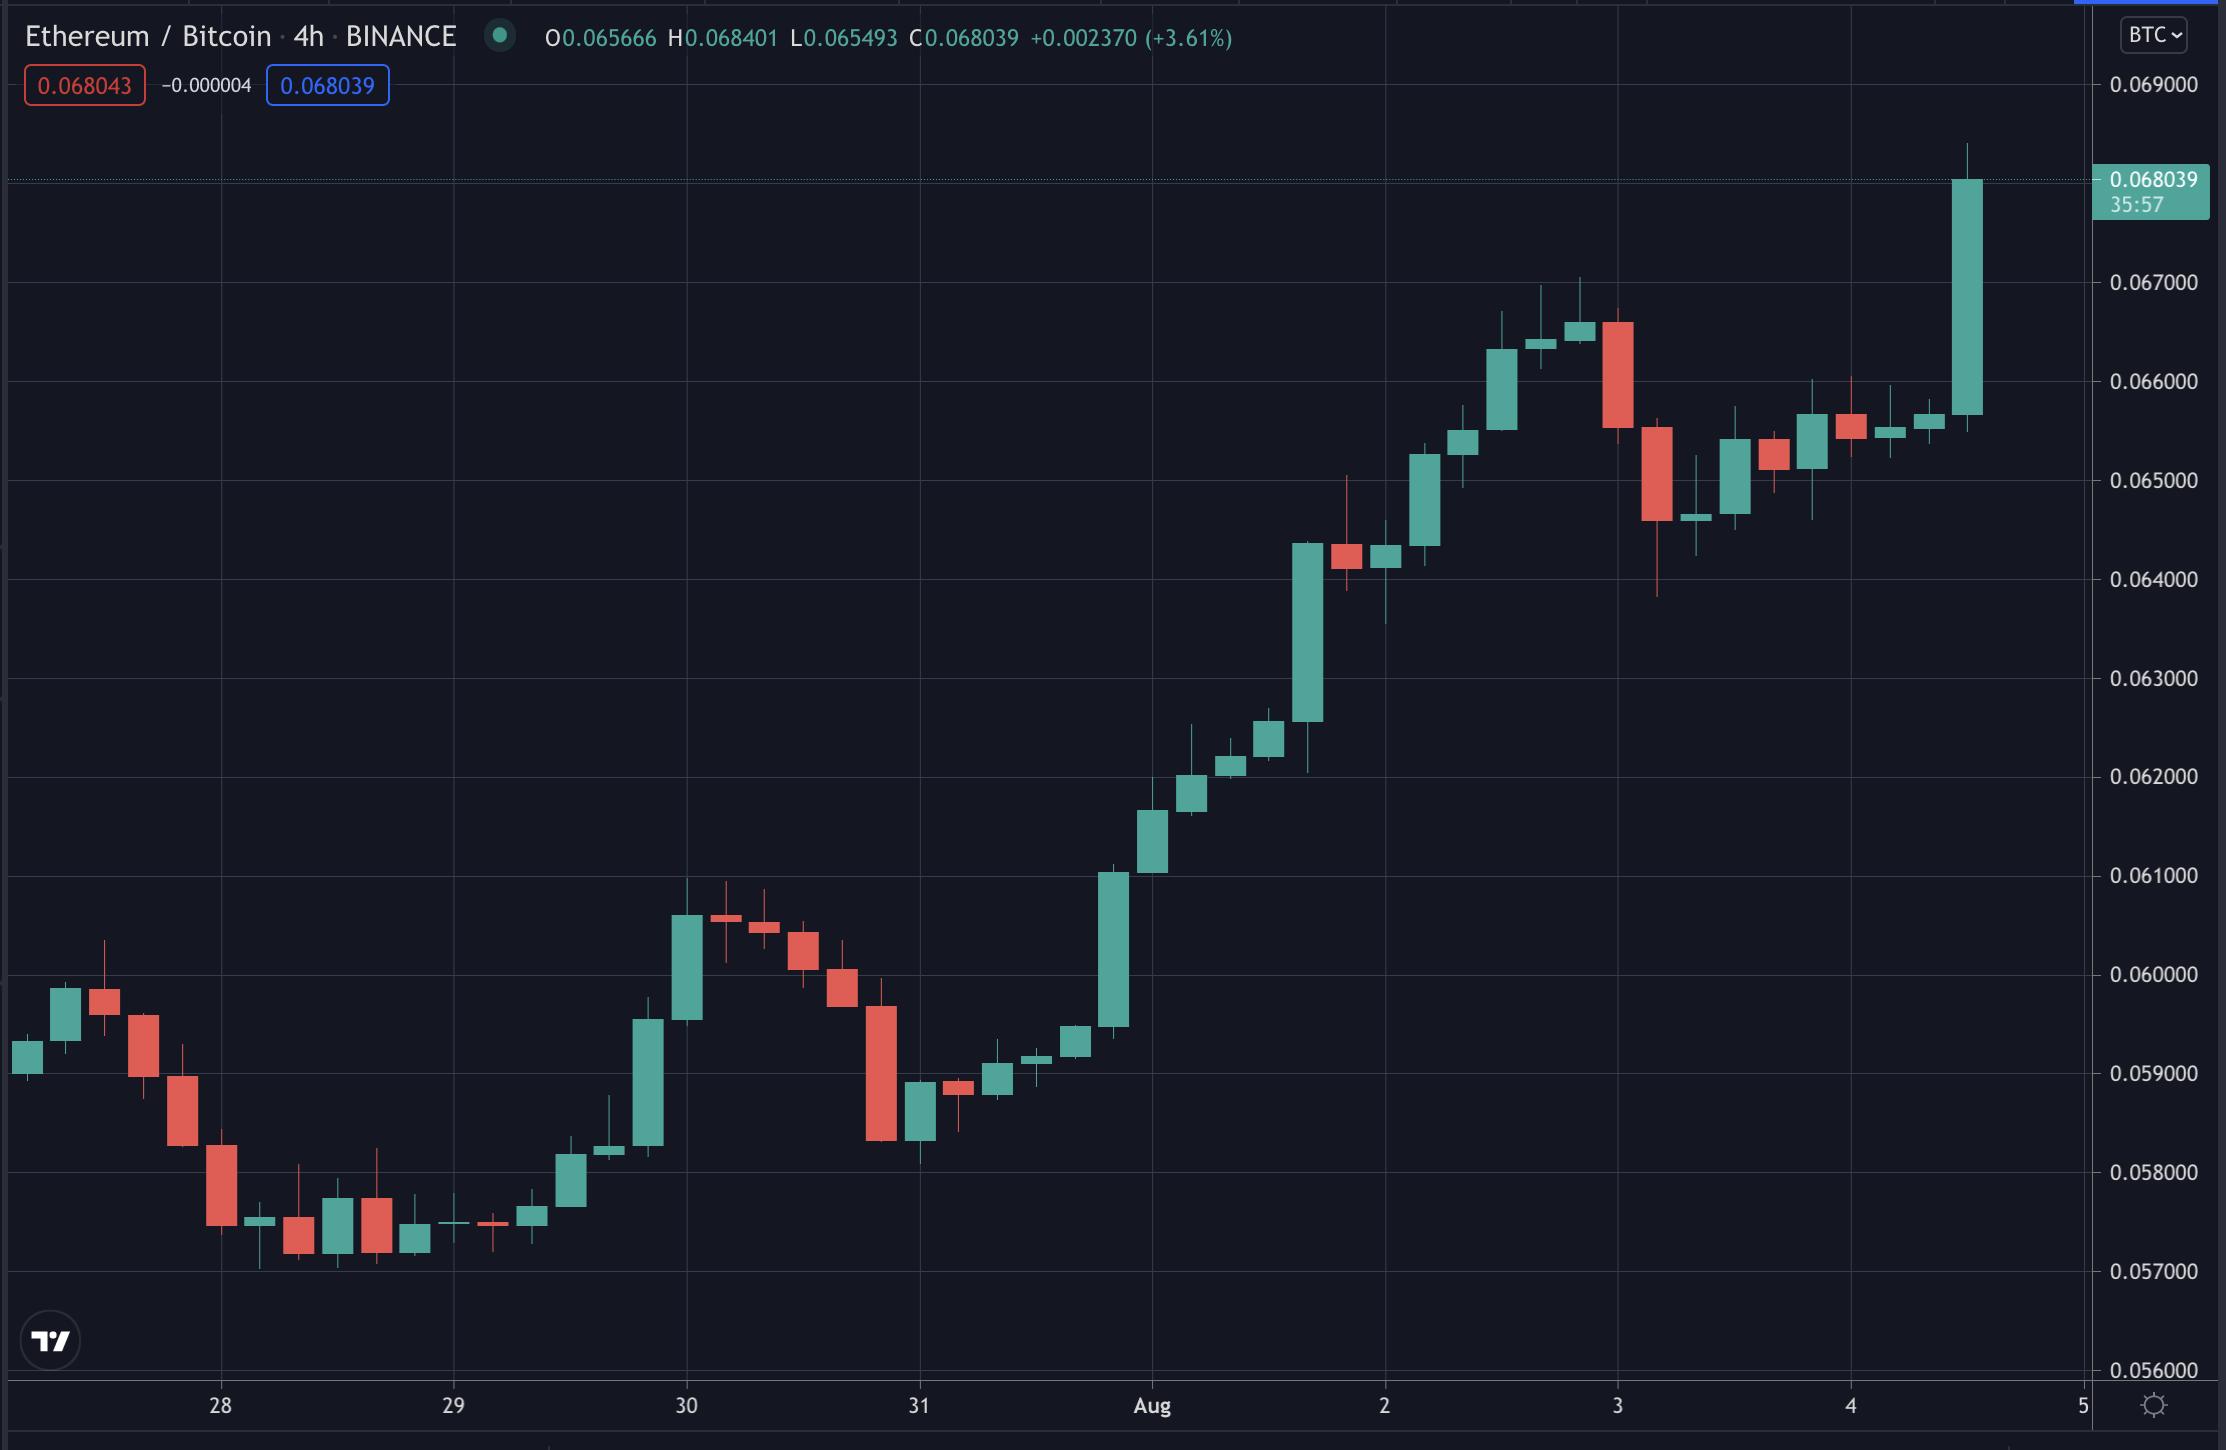 ETH/BTC ratio, Aug 2021